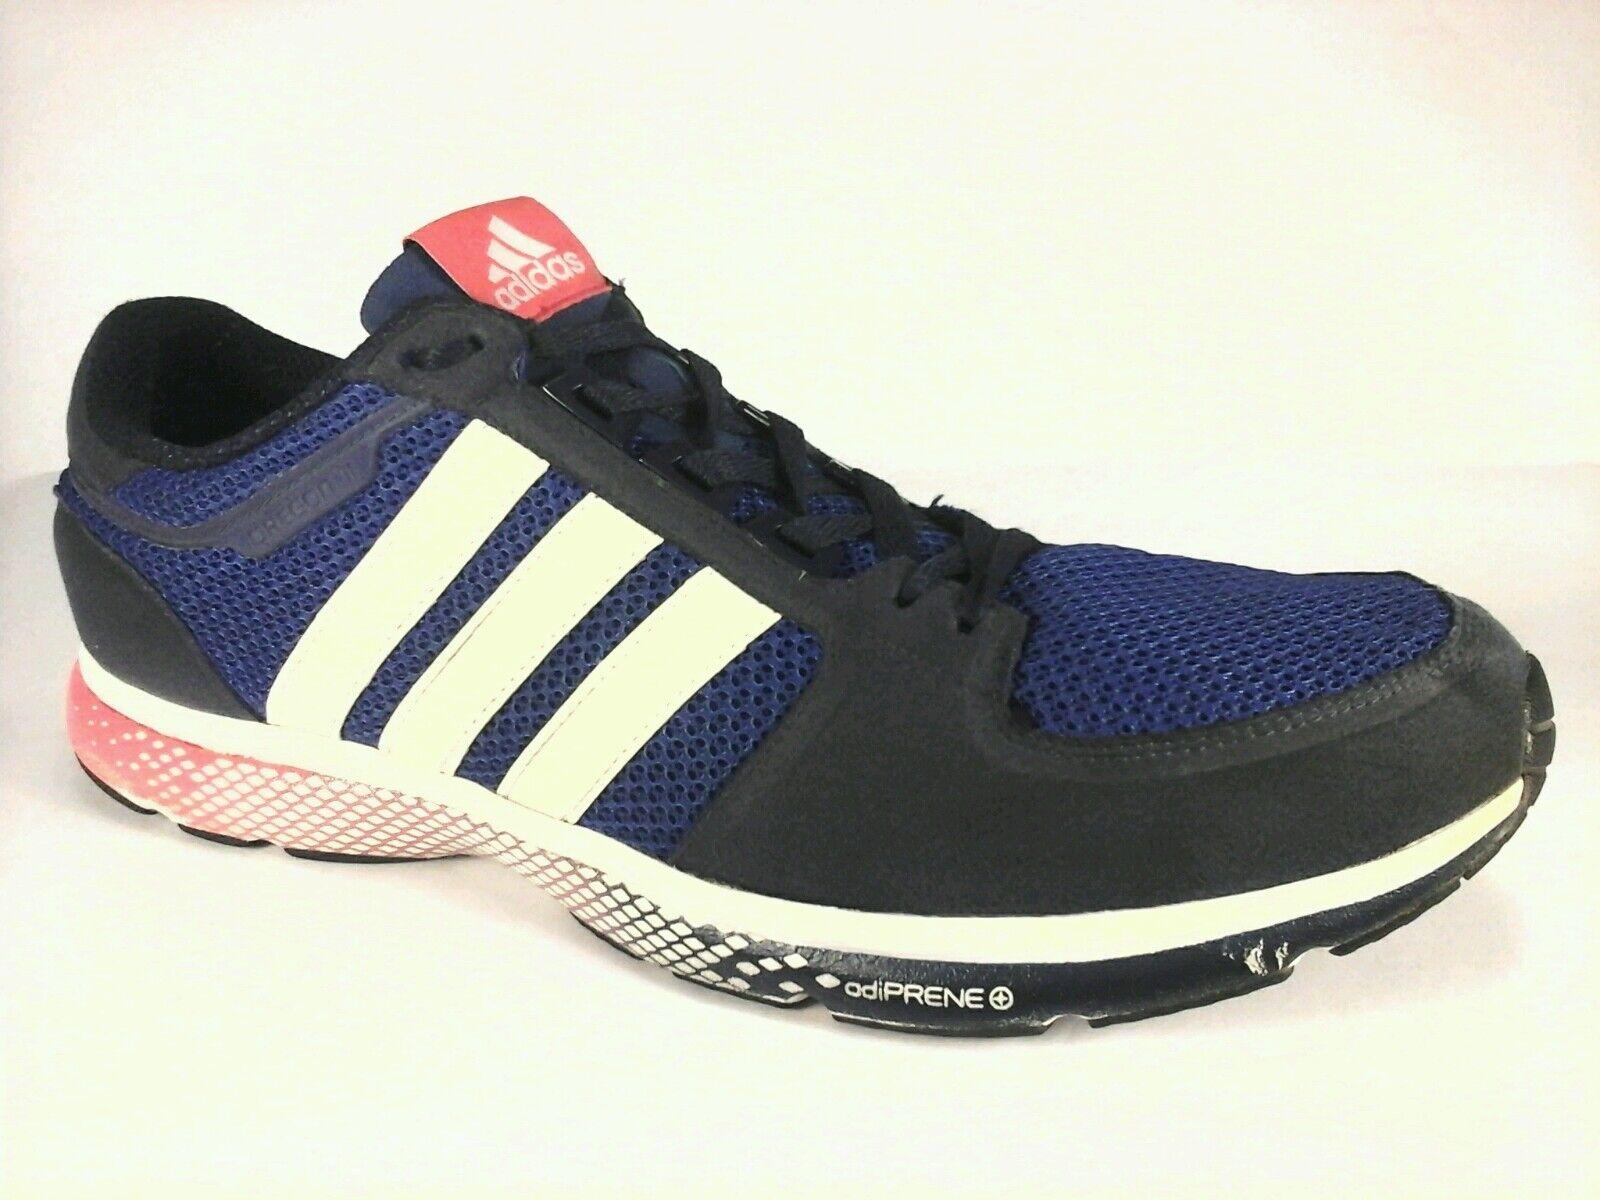 ADIDAS Sneakers Oregon Blue/White Retro Style Shoes Men's US 14 M